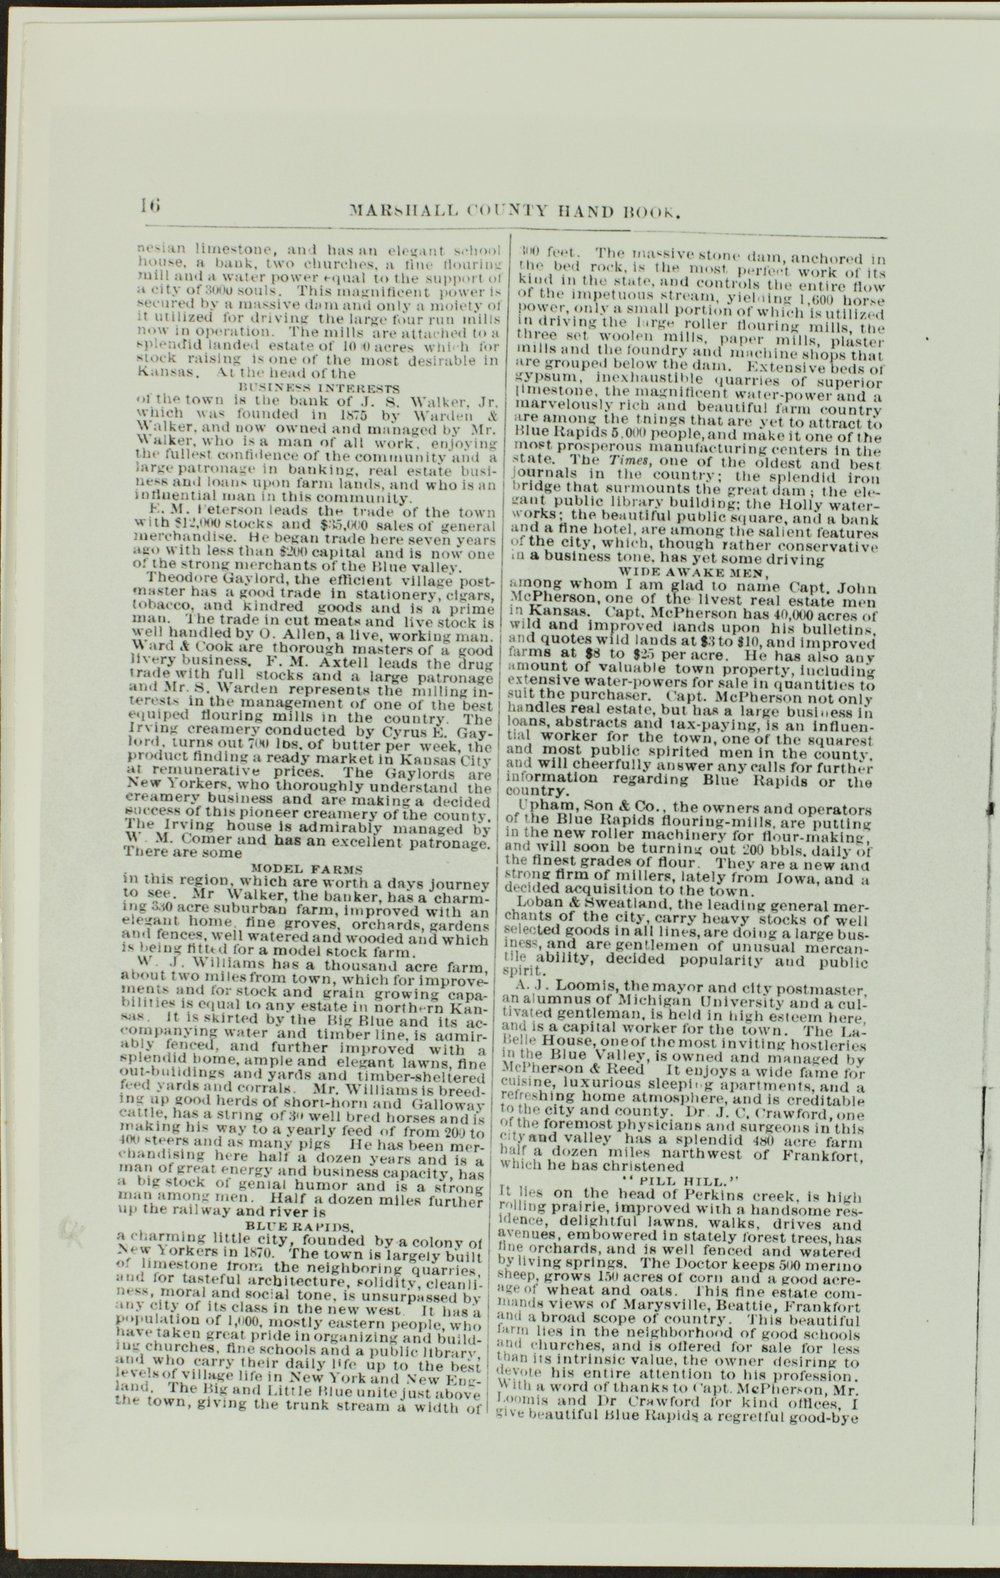 Handbook of Marshall County, Kansas - Page 16